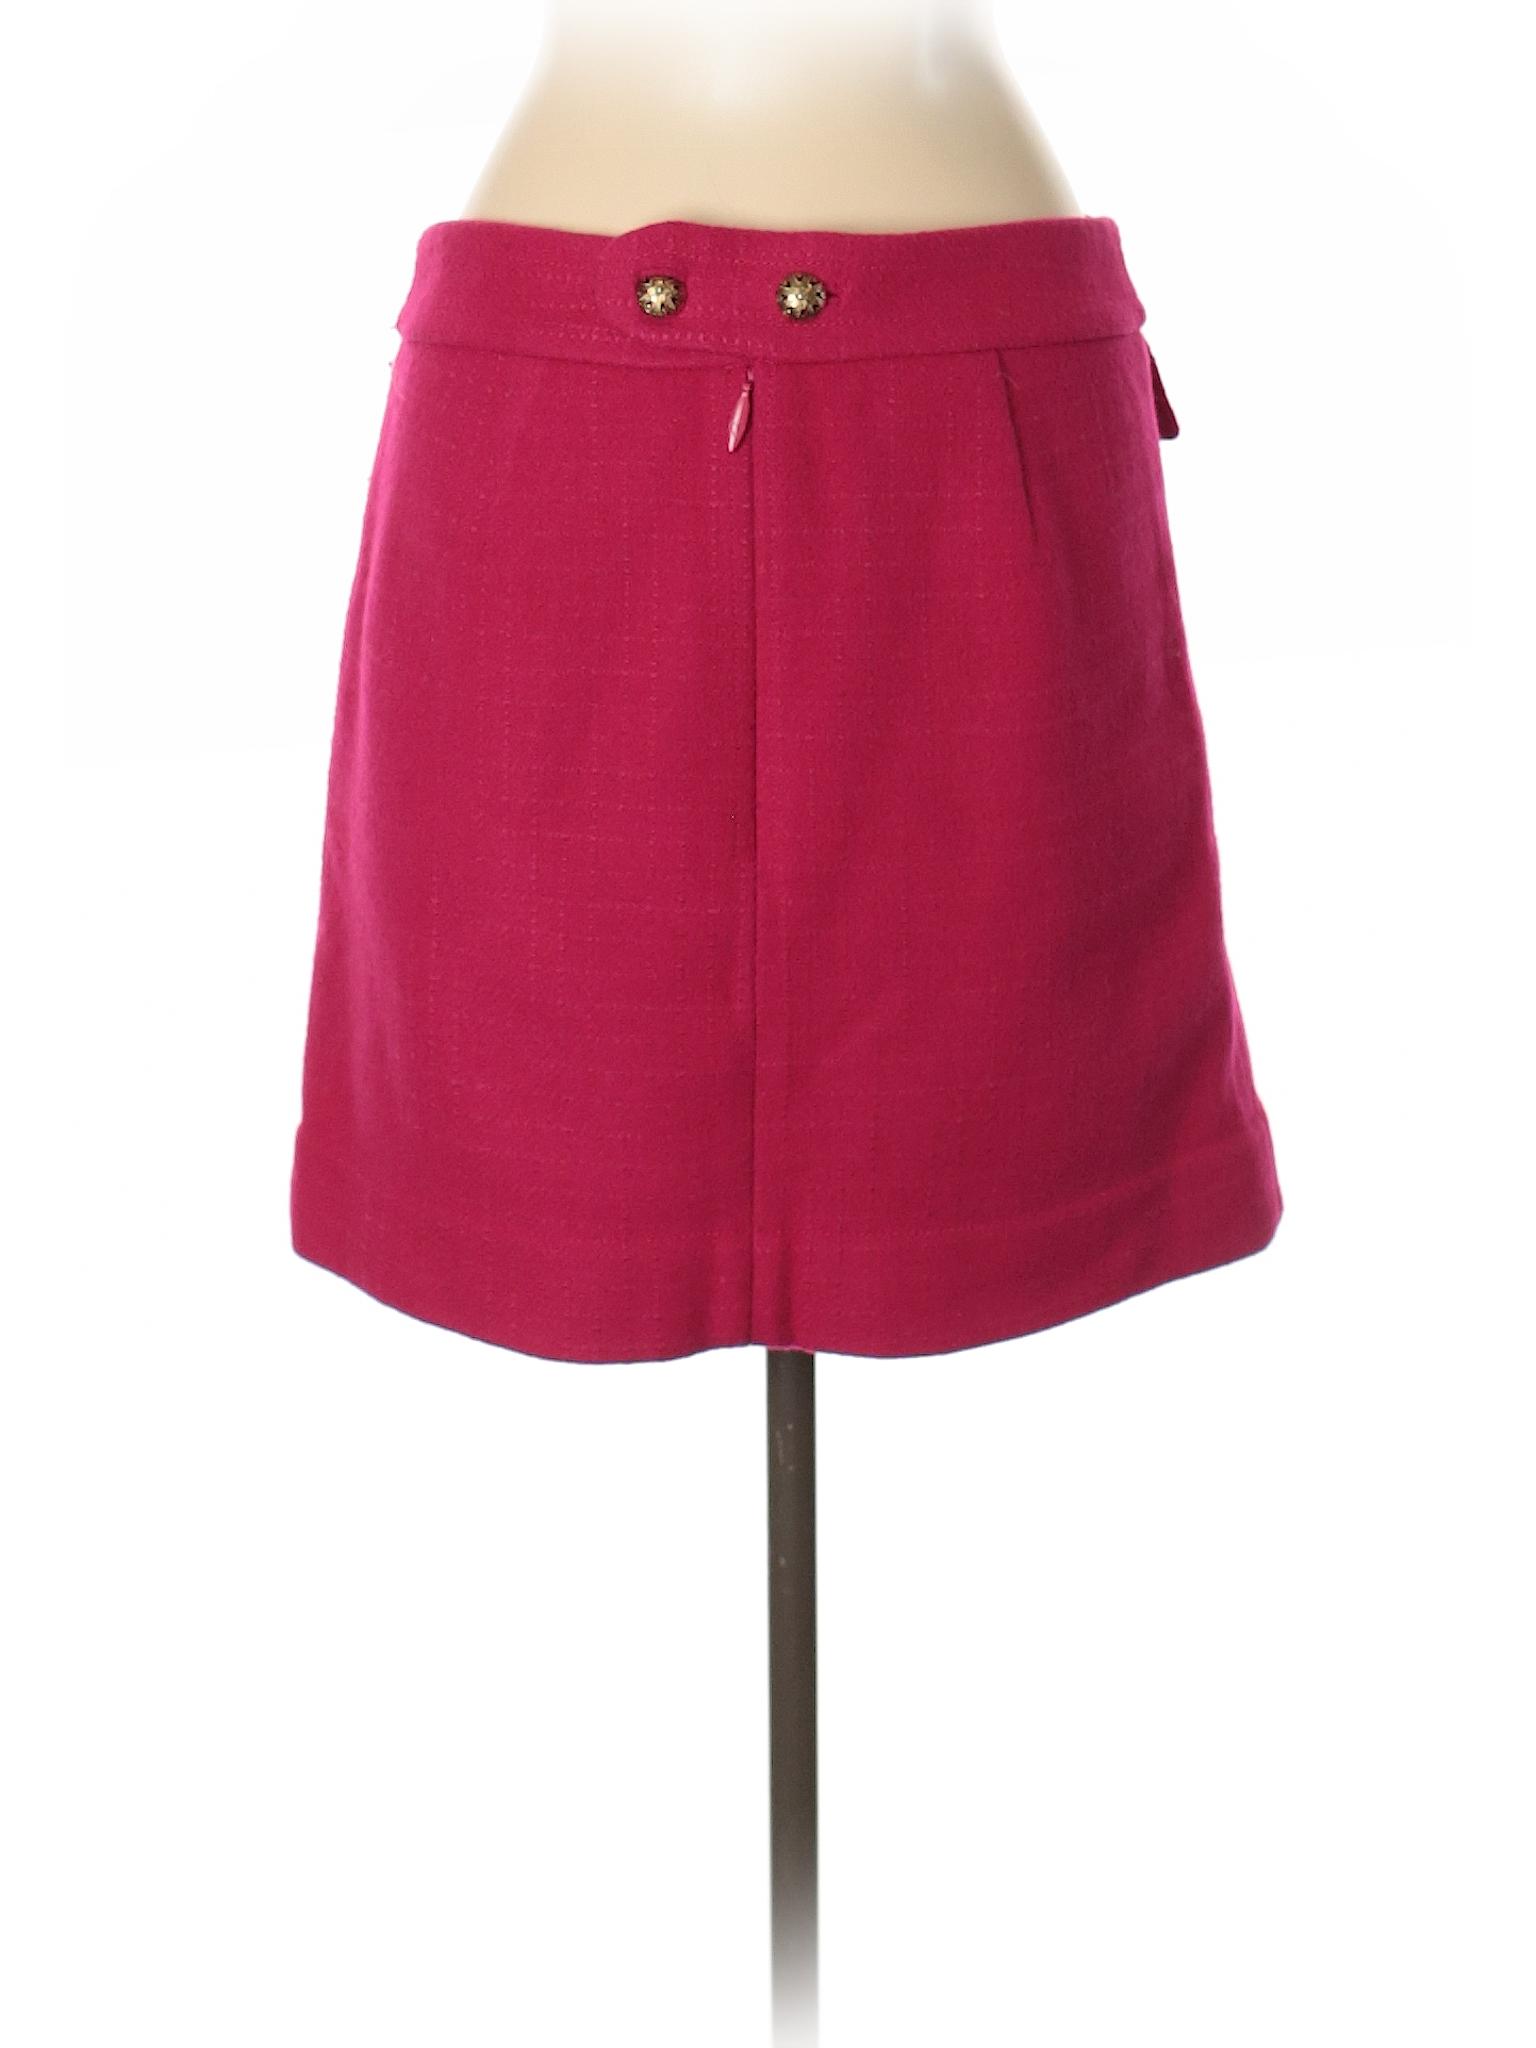 Boutique Skirt Boutique Wool Wool Boutique Wool Boutique Wool Skirt Skirt ZT4Yc1q